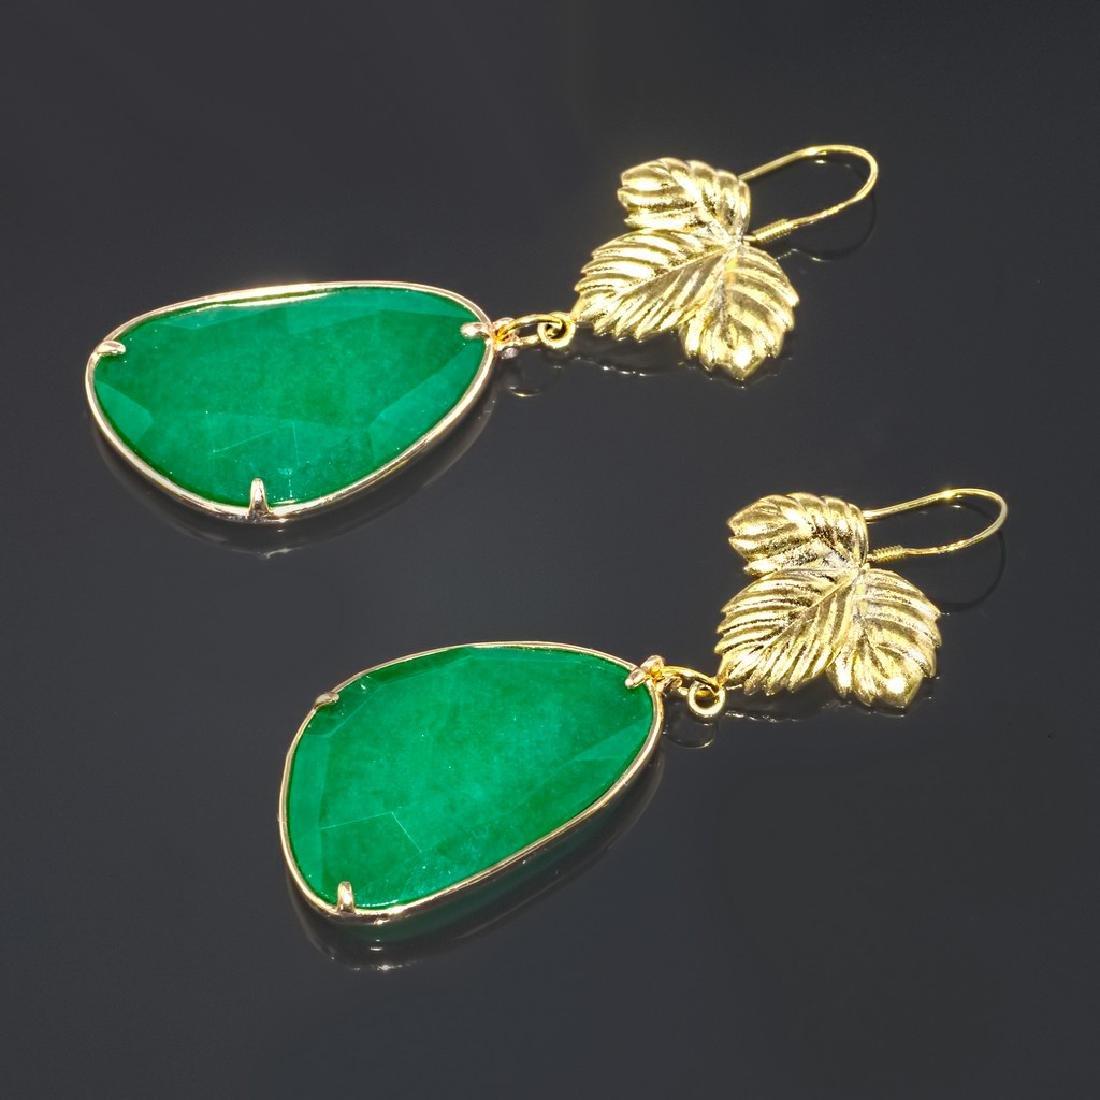 Emerald Green Jade Leaf Earrings - 3